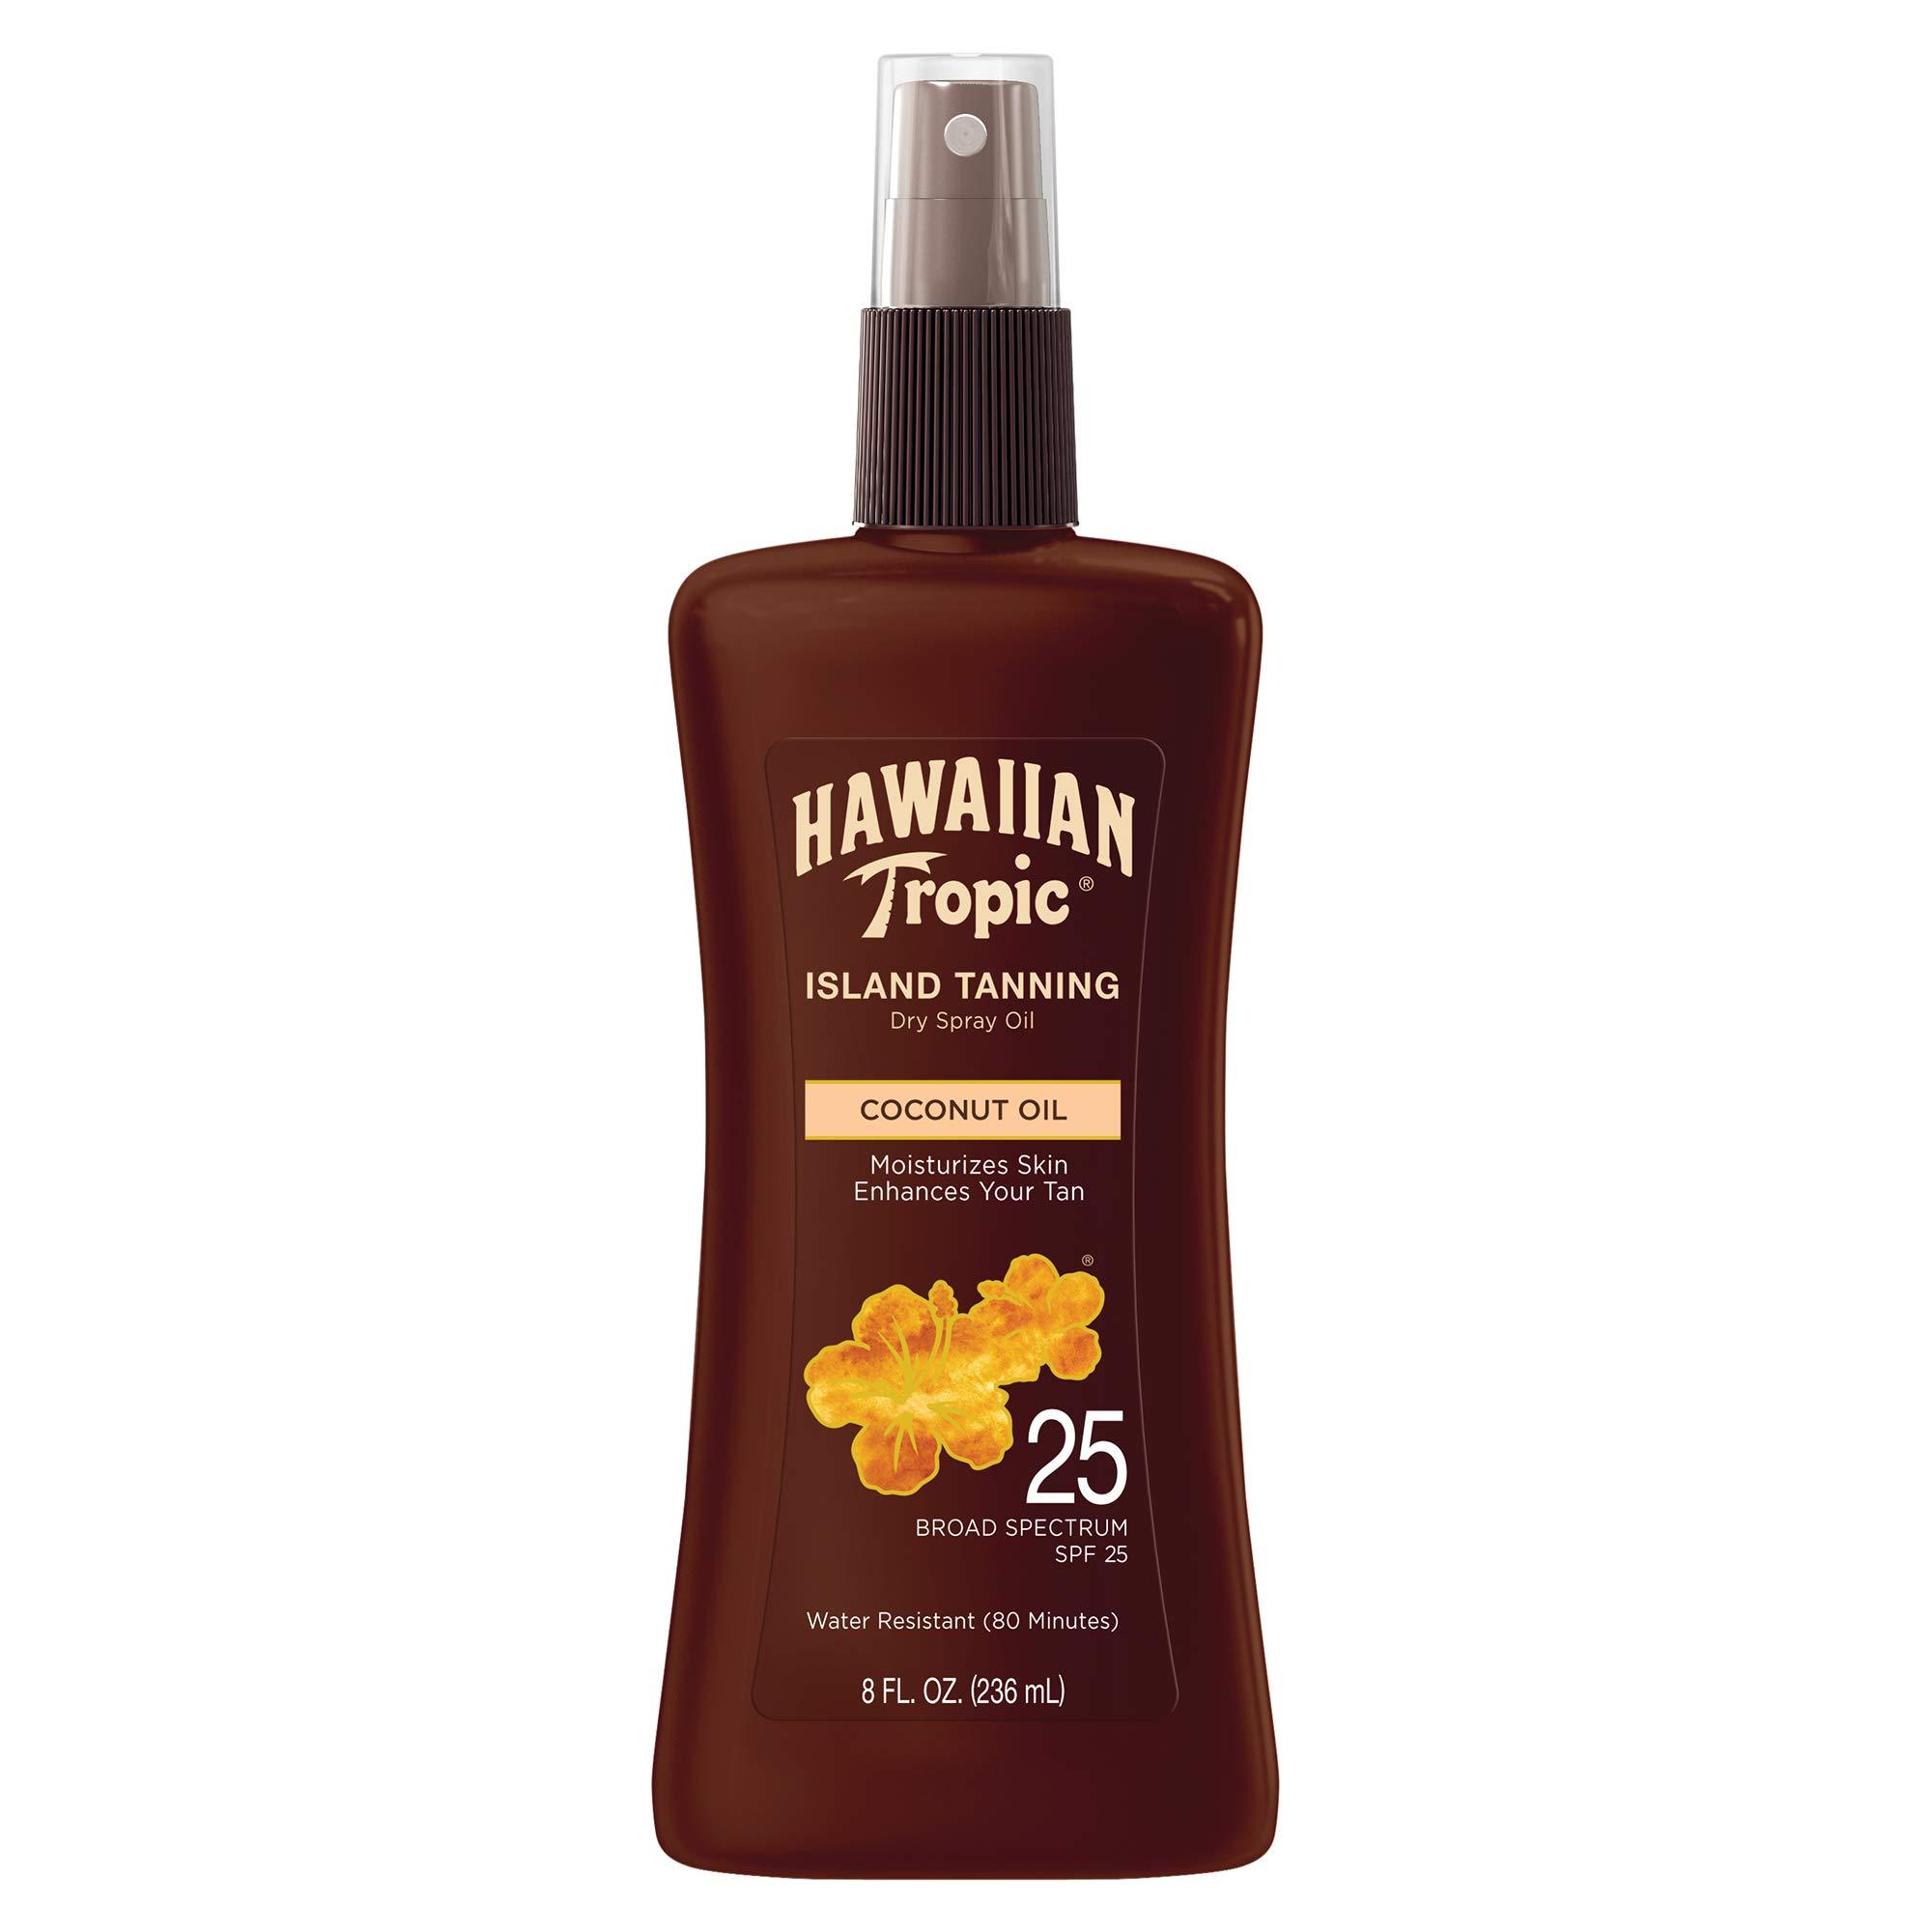 Hawaiian Tropic Tanning Oil Pump Spray, SPF 25, 8 Fl Oz by Hawaiian Tropic